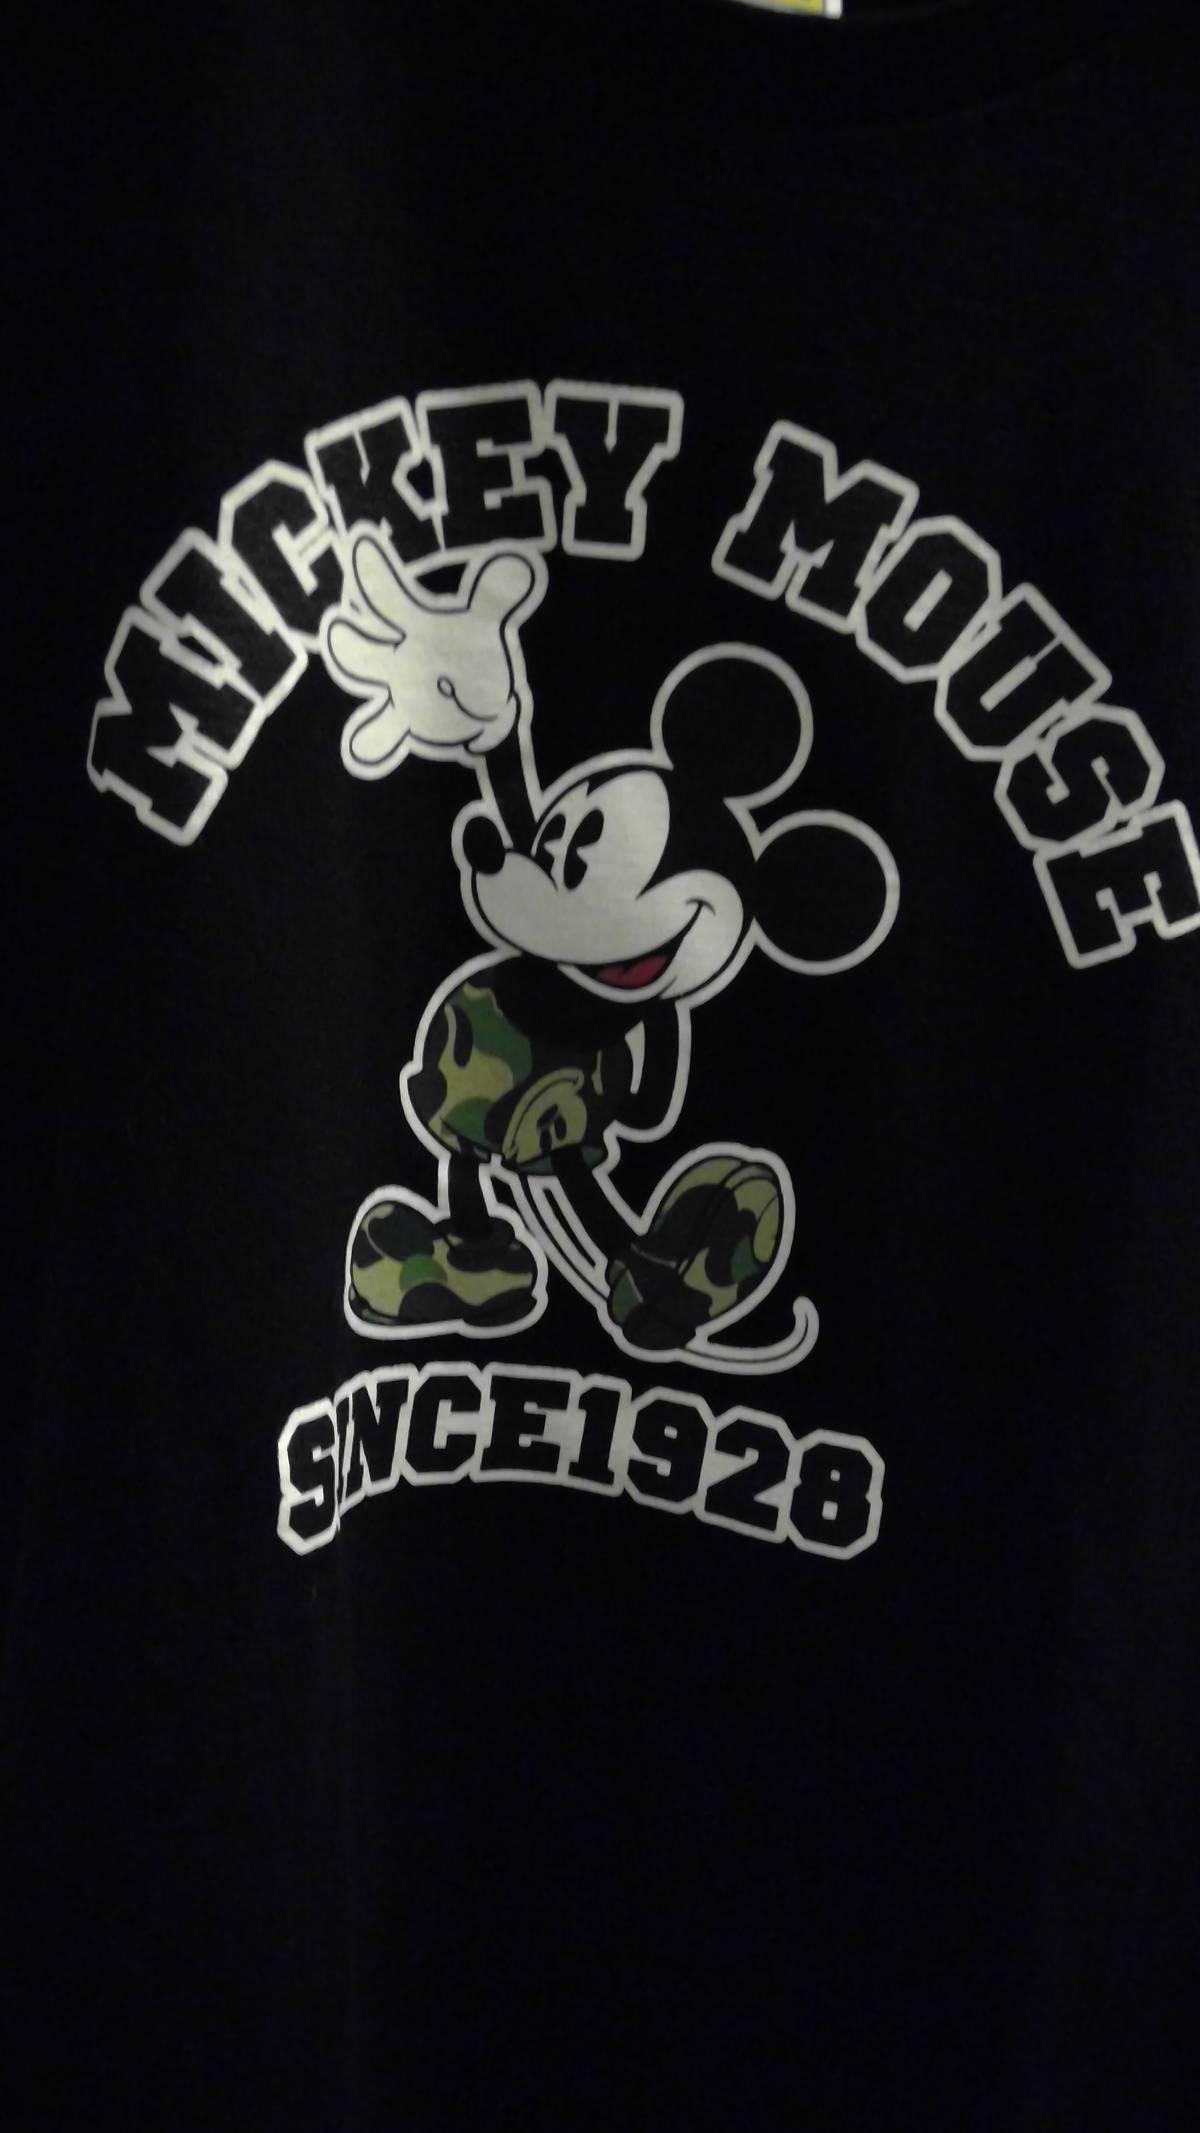 c02cf849 Bape Mickey Mouse Black Bape X Disney T-shirt | Grailed